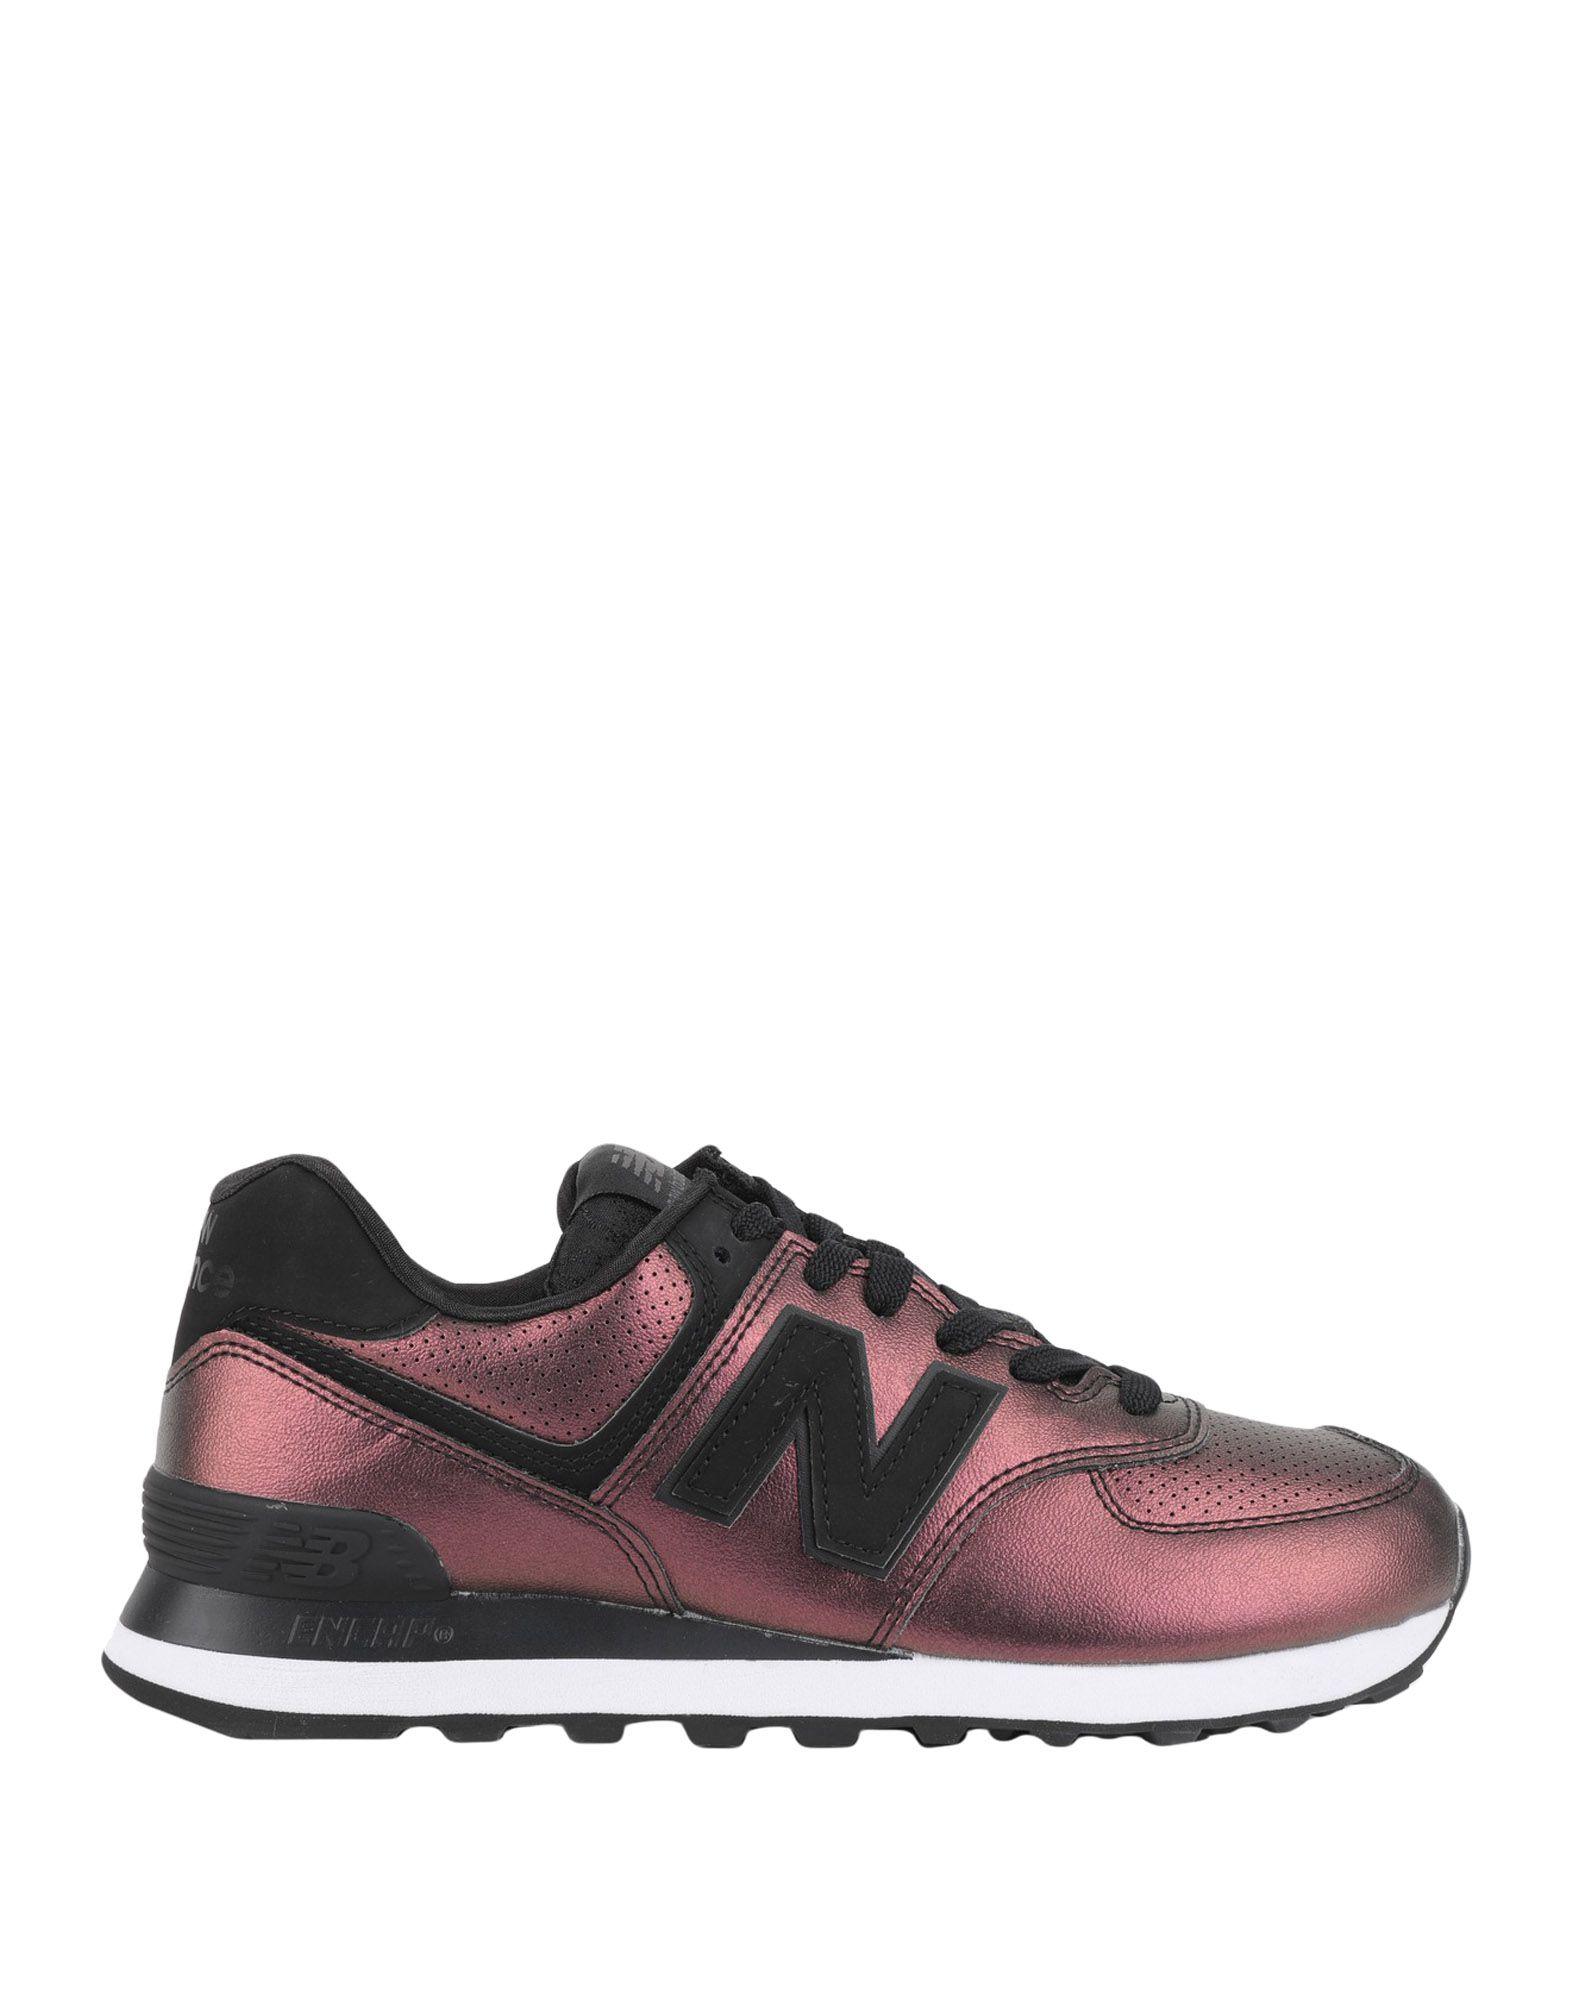 New Balance Sneakers - Women New  Balance Sneakers online on  New United Kingdom - 11567724FO 5db6f4